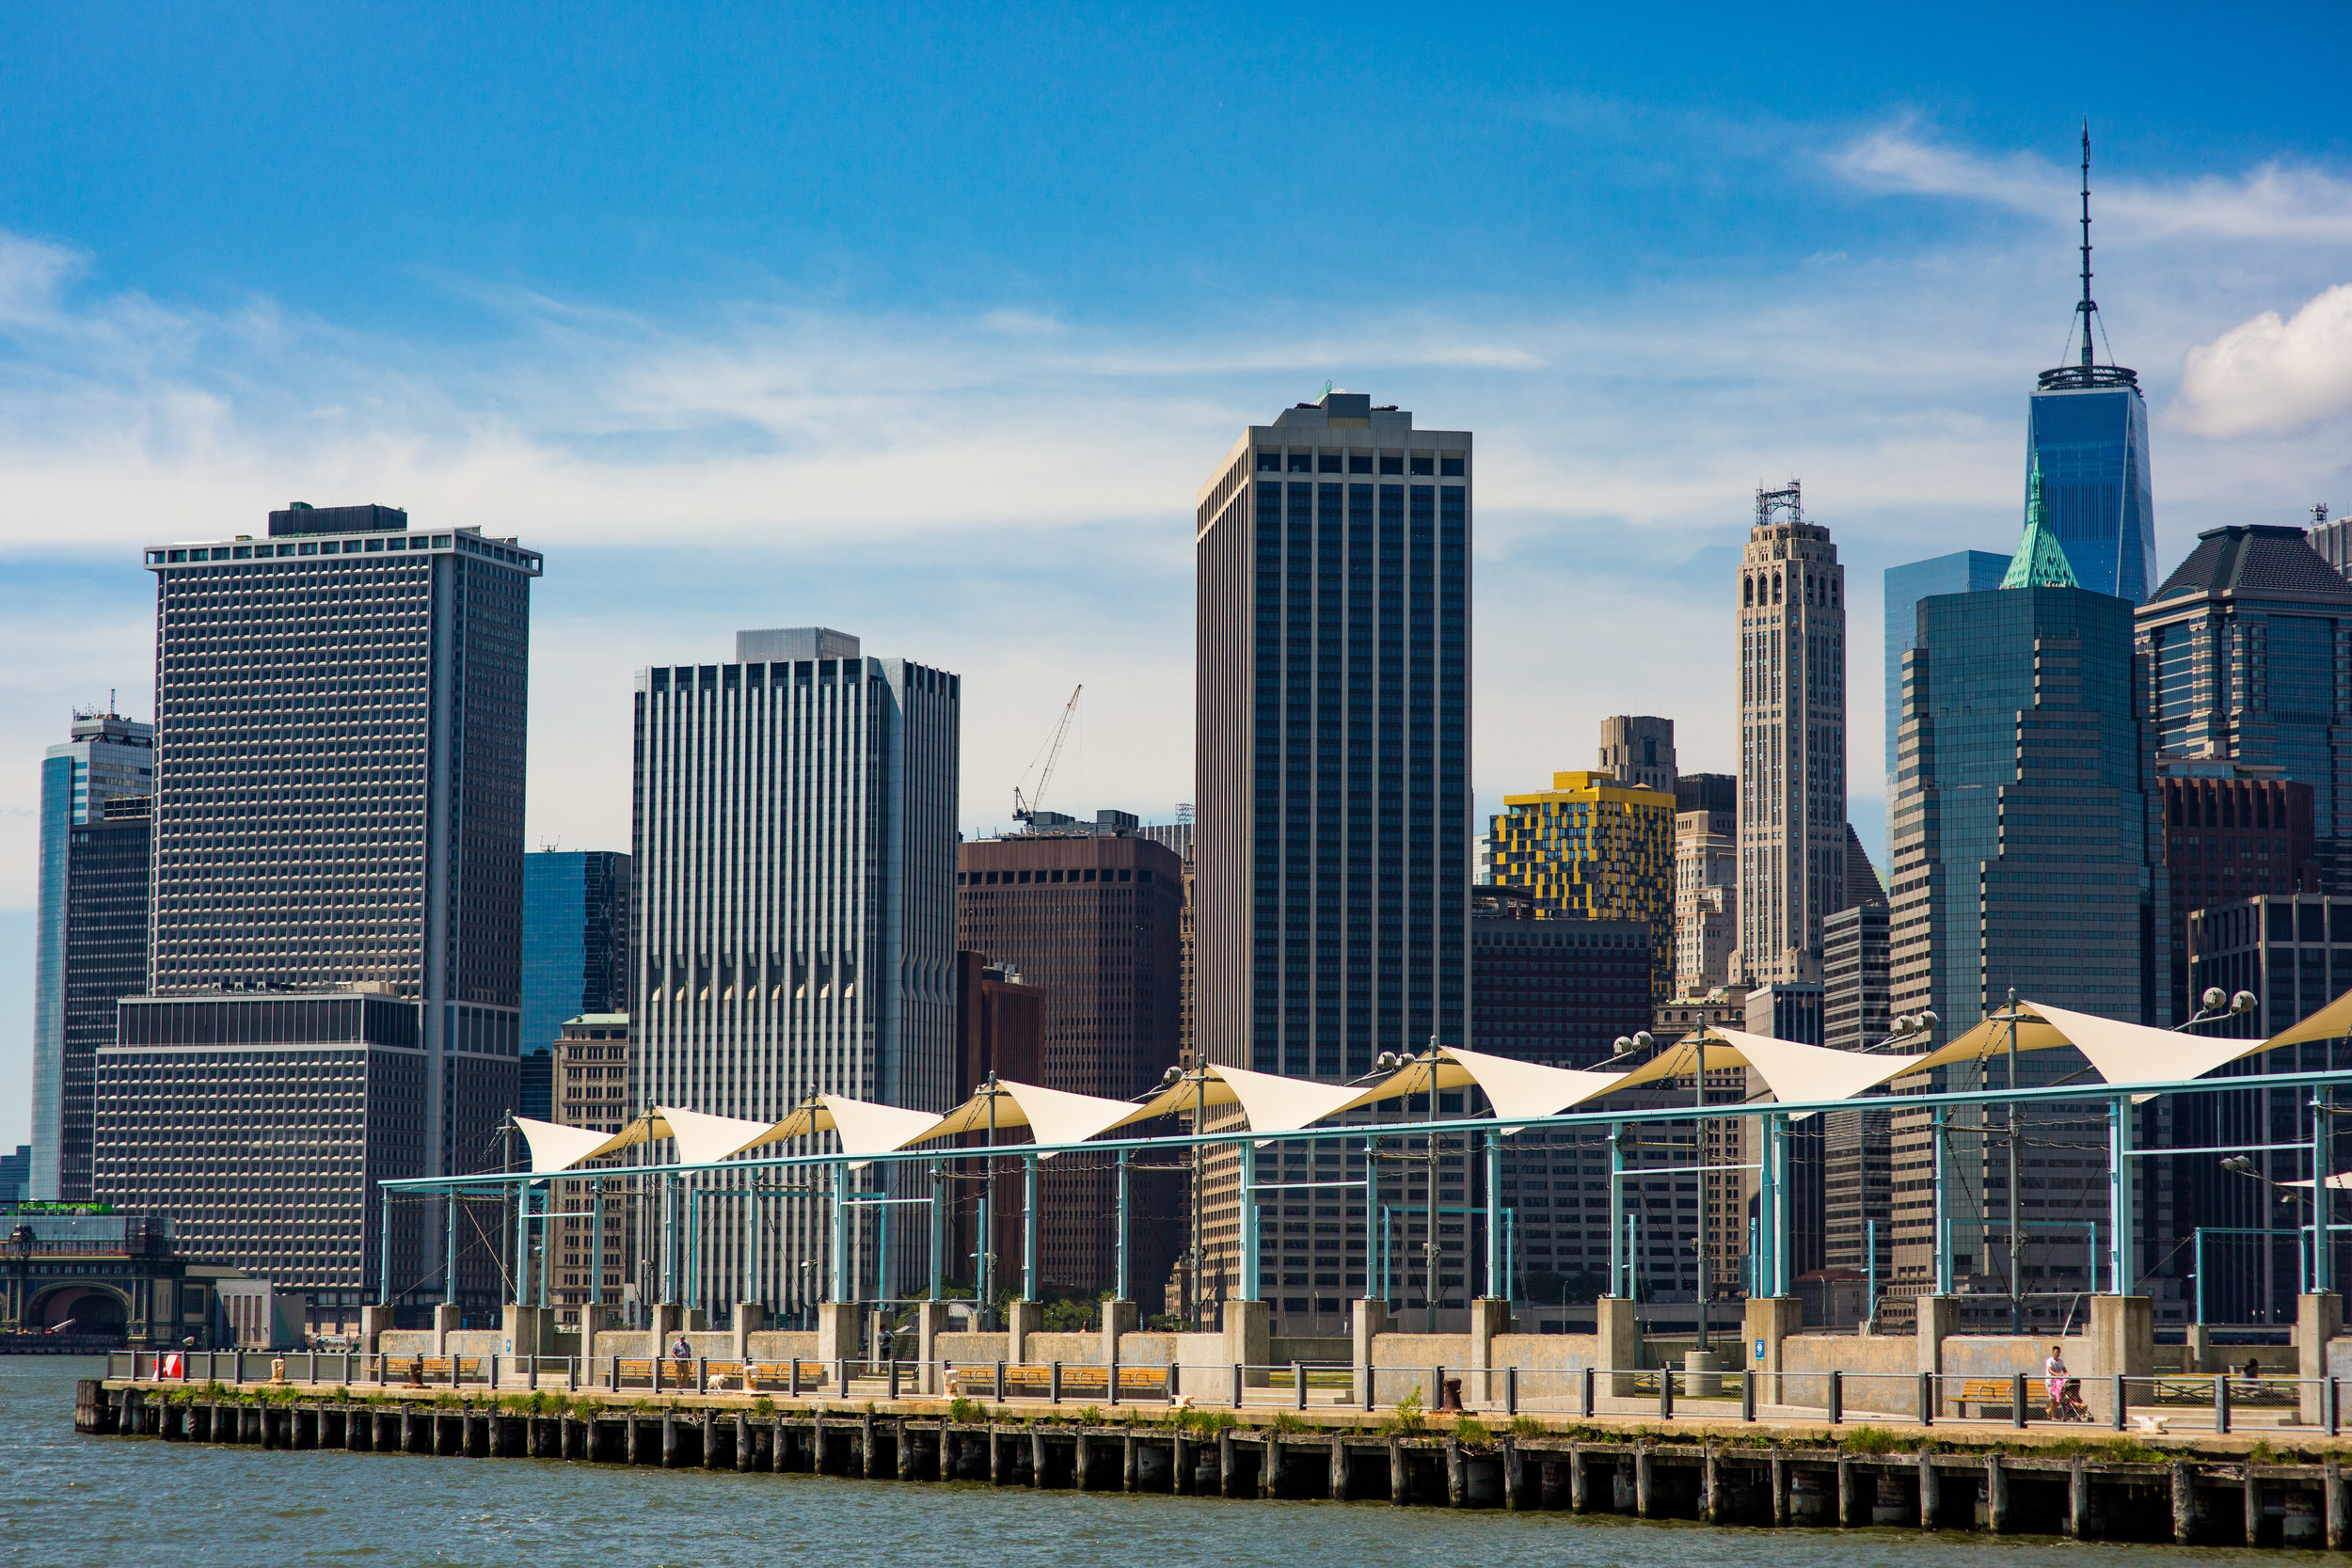 LSNY_Brooklyn_Bridge_Park-9.jpg